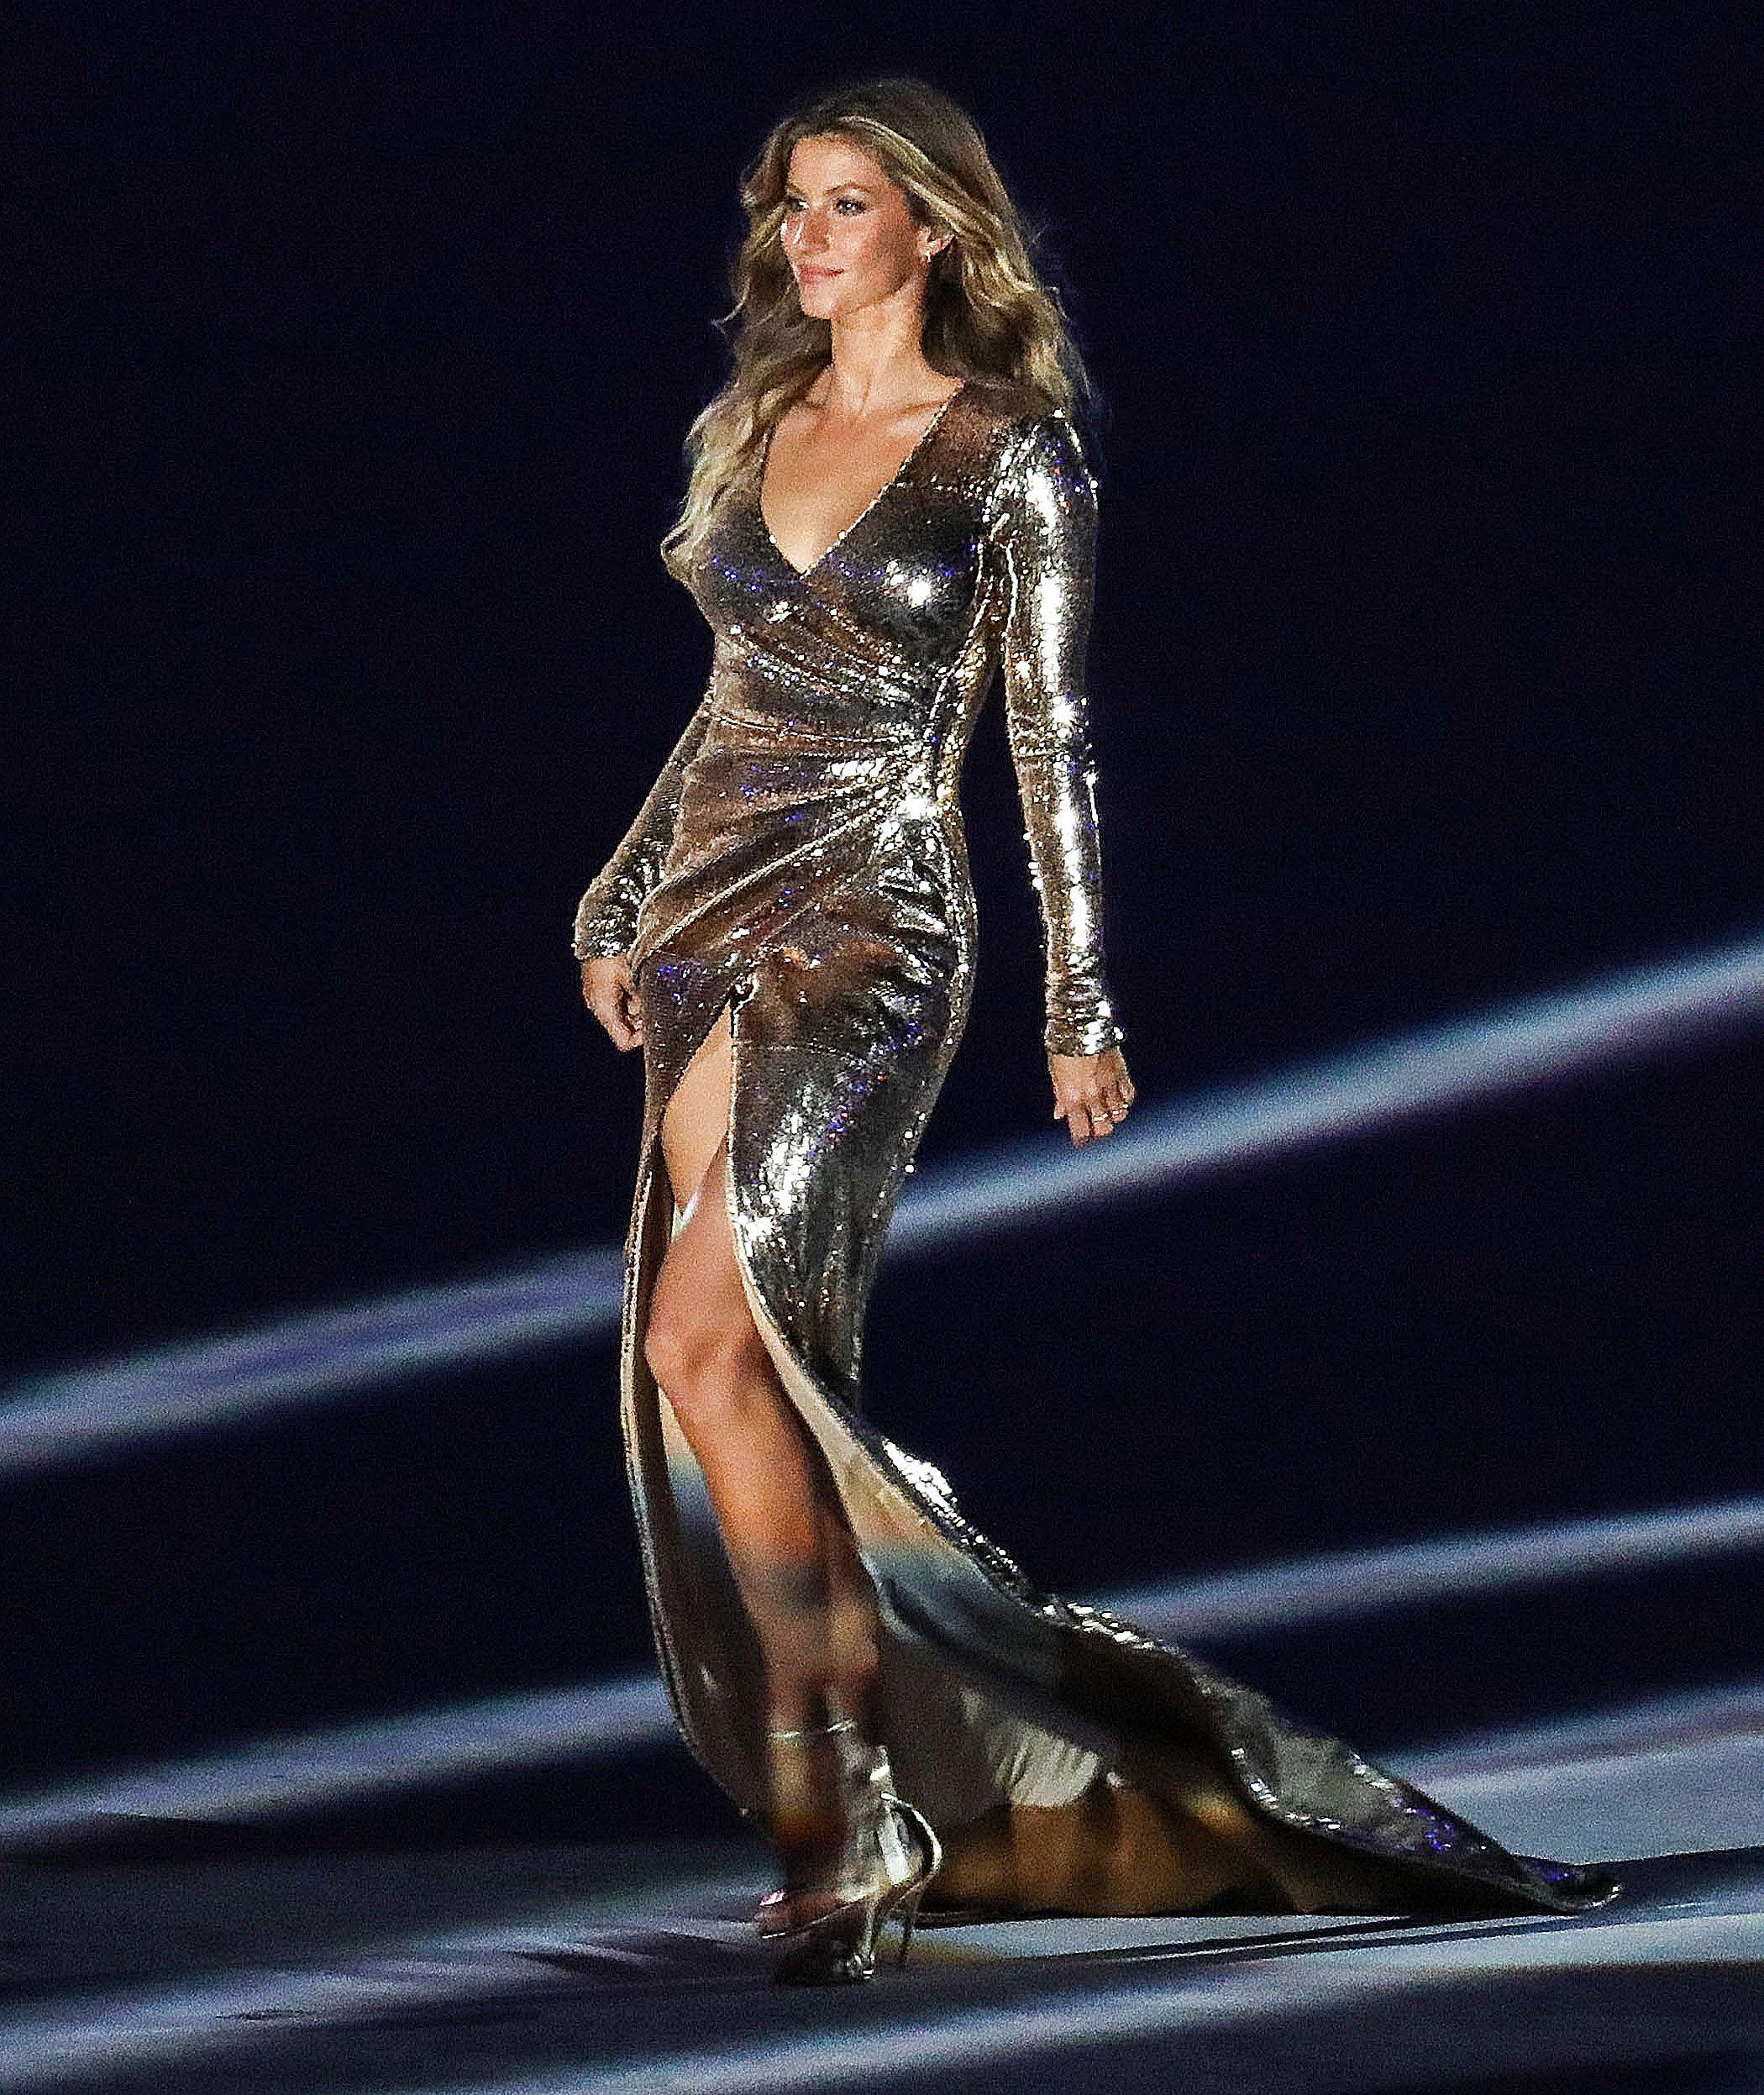 Gisele Bündchen Walking At The Olympics